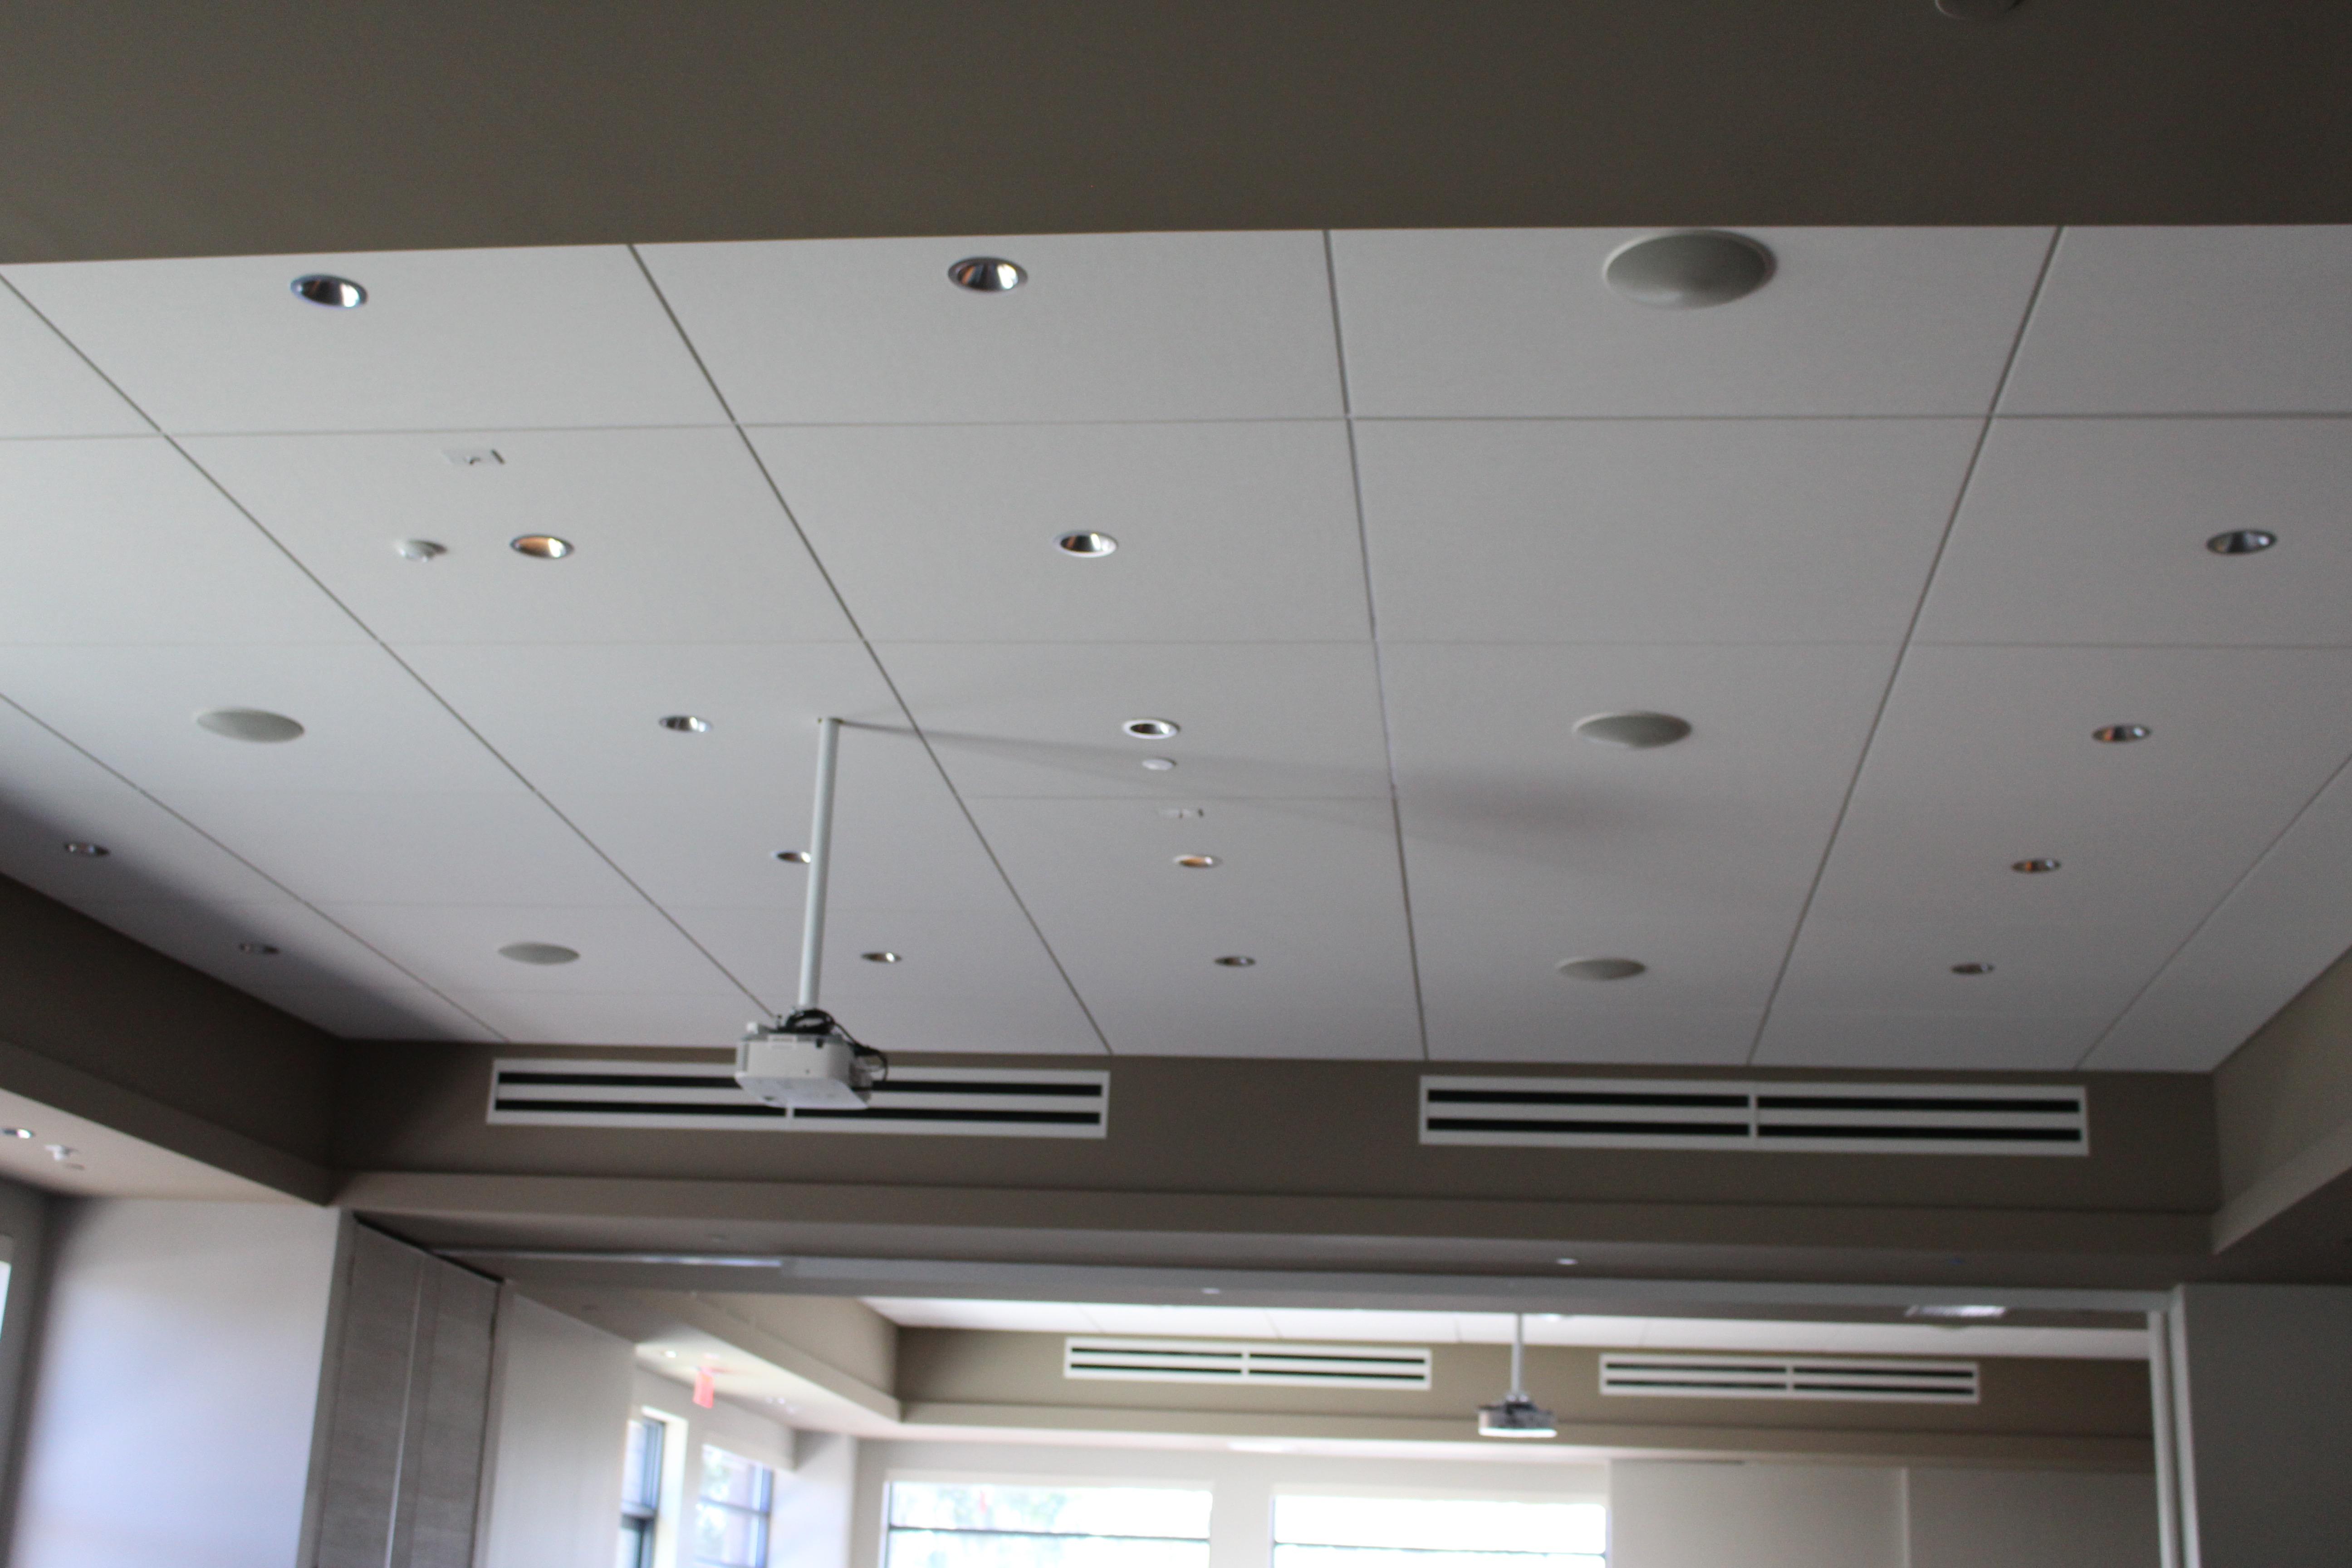 4' x 4' Ceiling Tiles